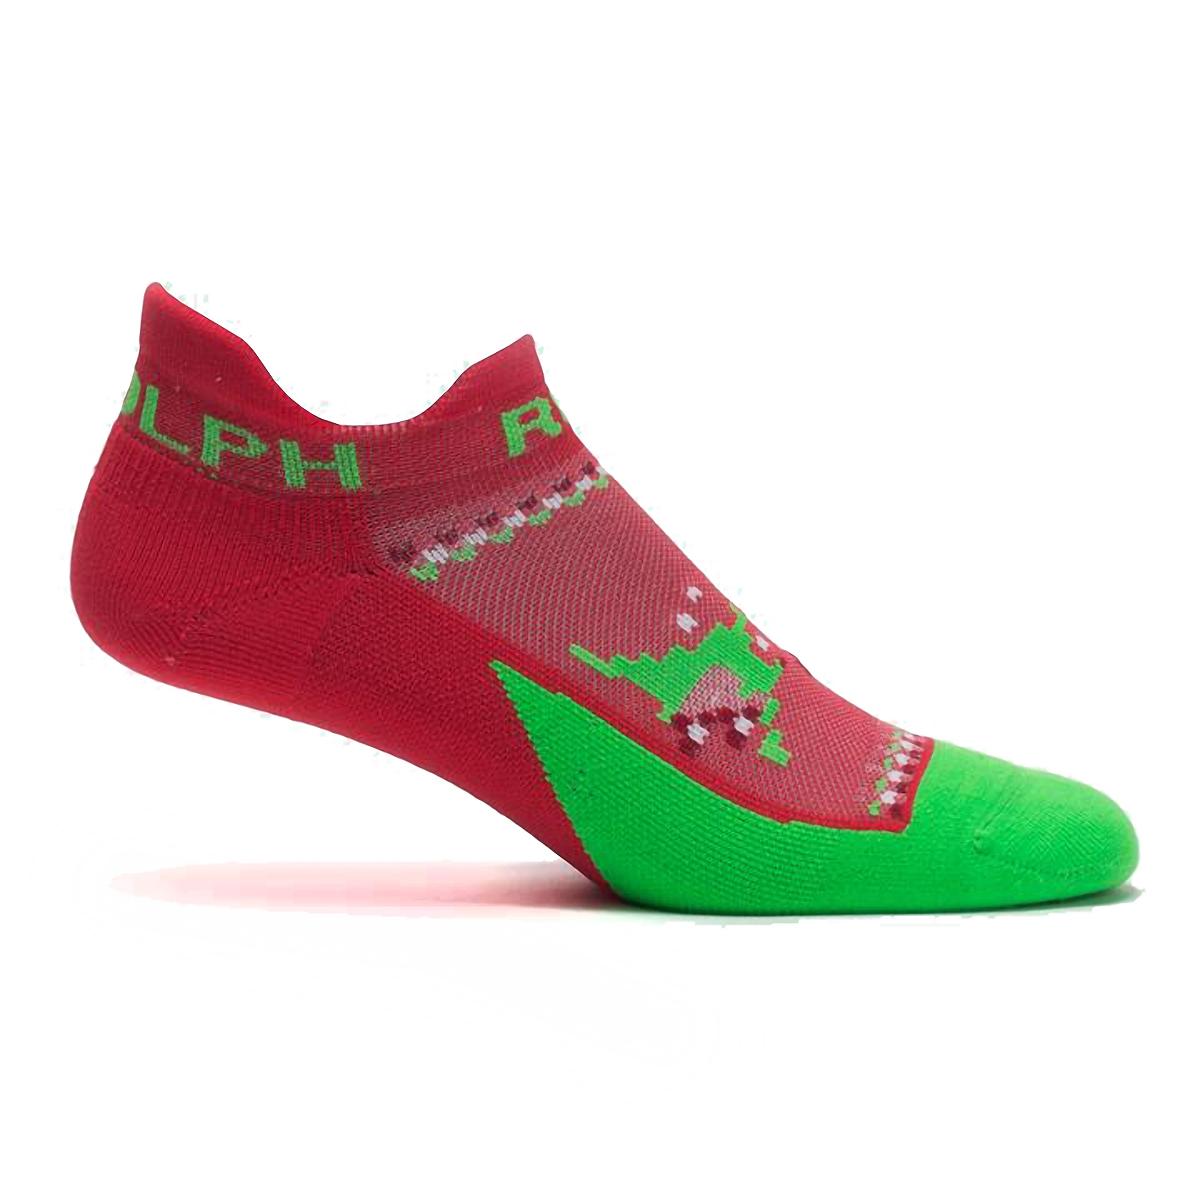 Feetures Elite Light Cushion No Show Tab Socks - Color: Run Rudolph - Size: S, Run Rudolph, large, image 1